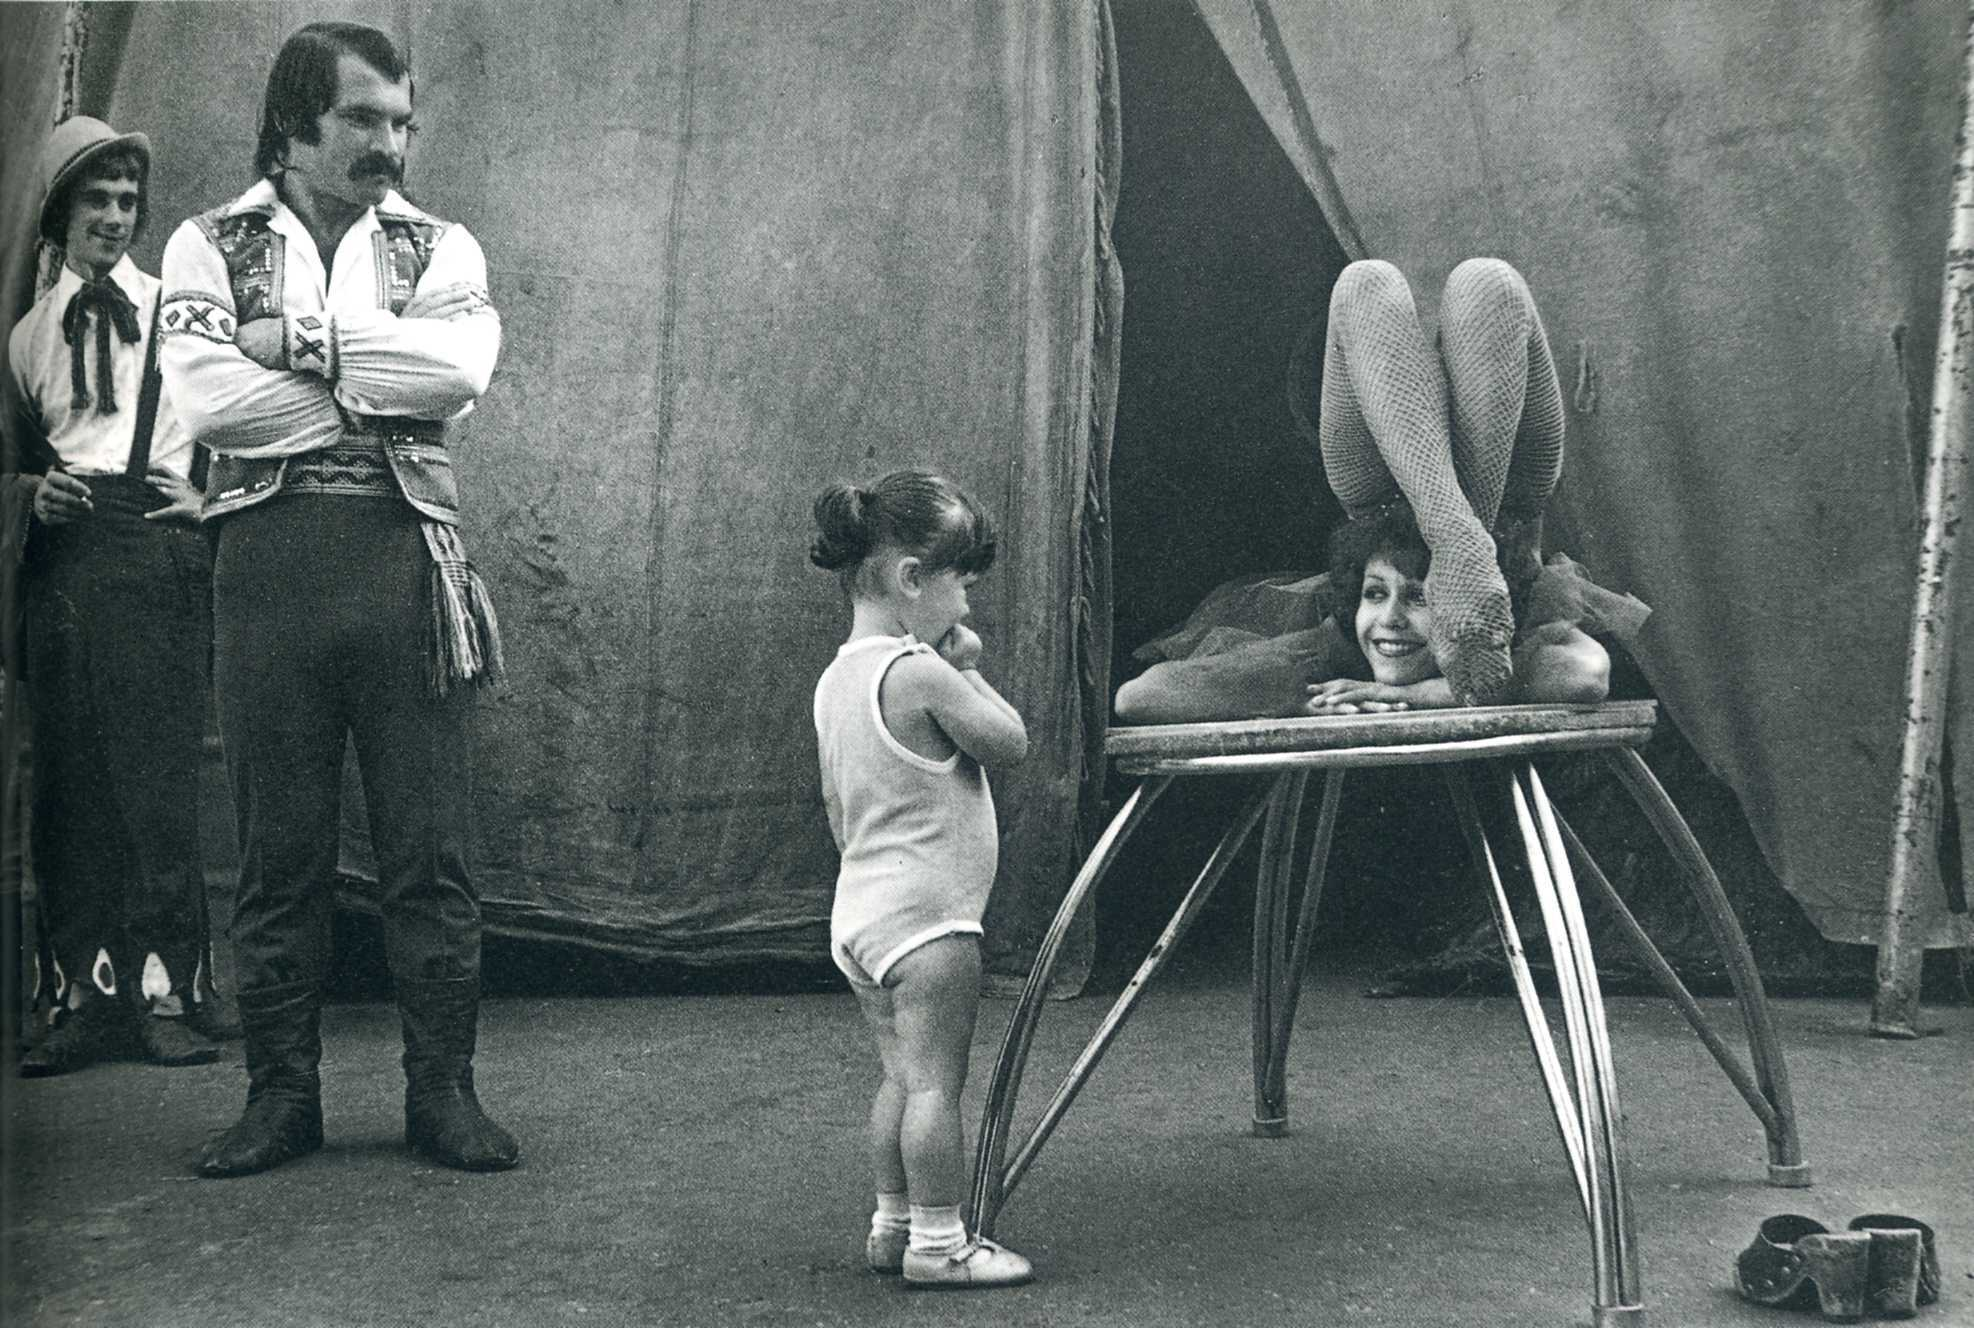 Советские фотографии » Дуделка ...: www.doodoo.ru/travel/5590-soviet-photos.html